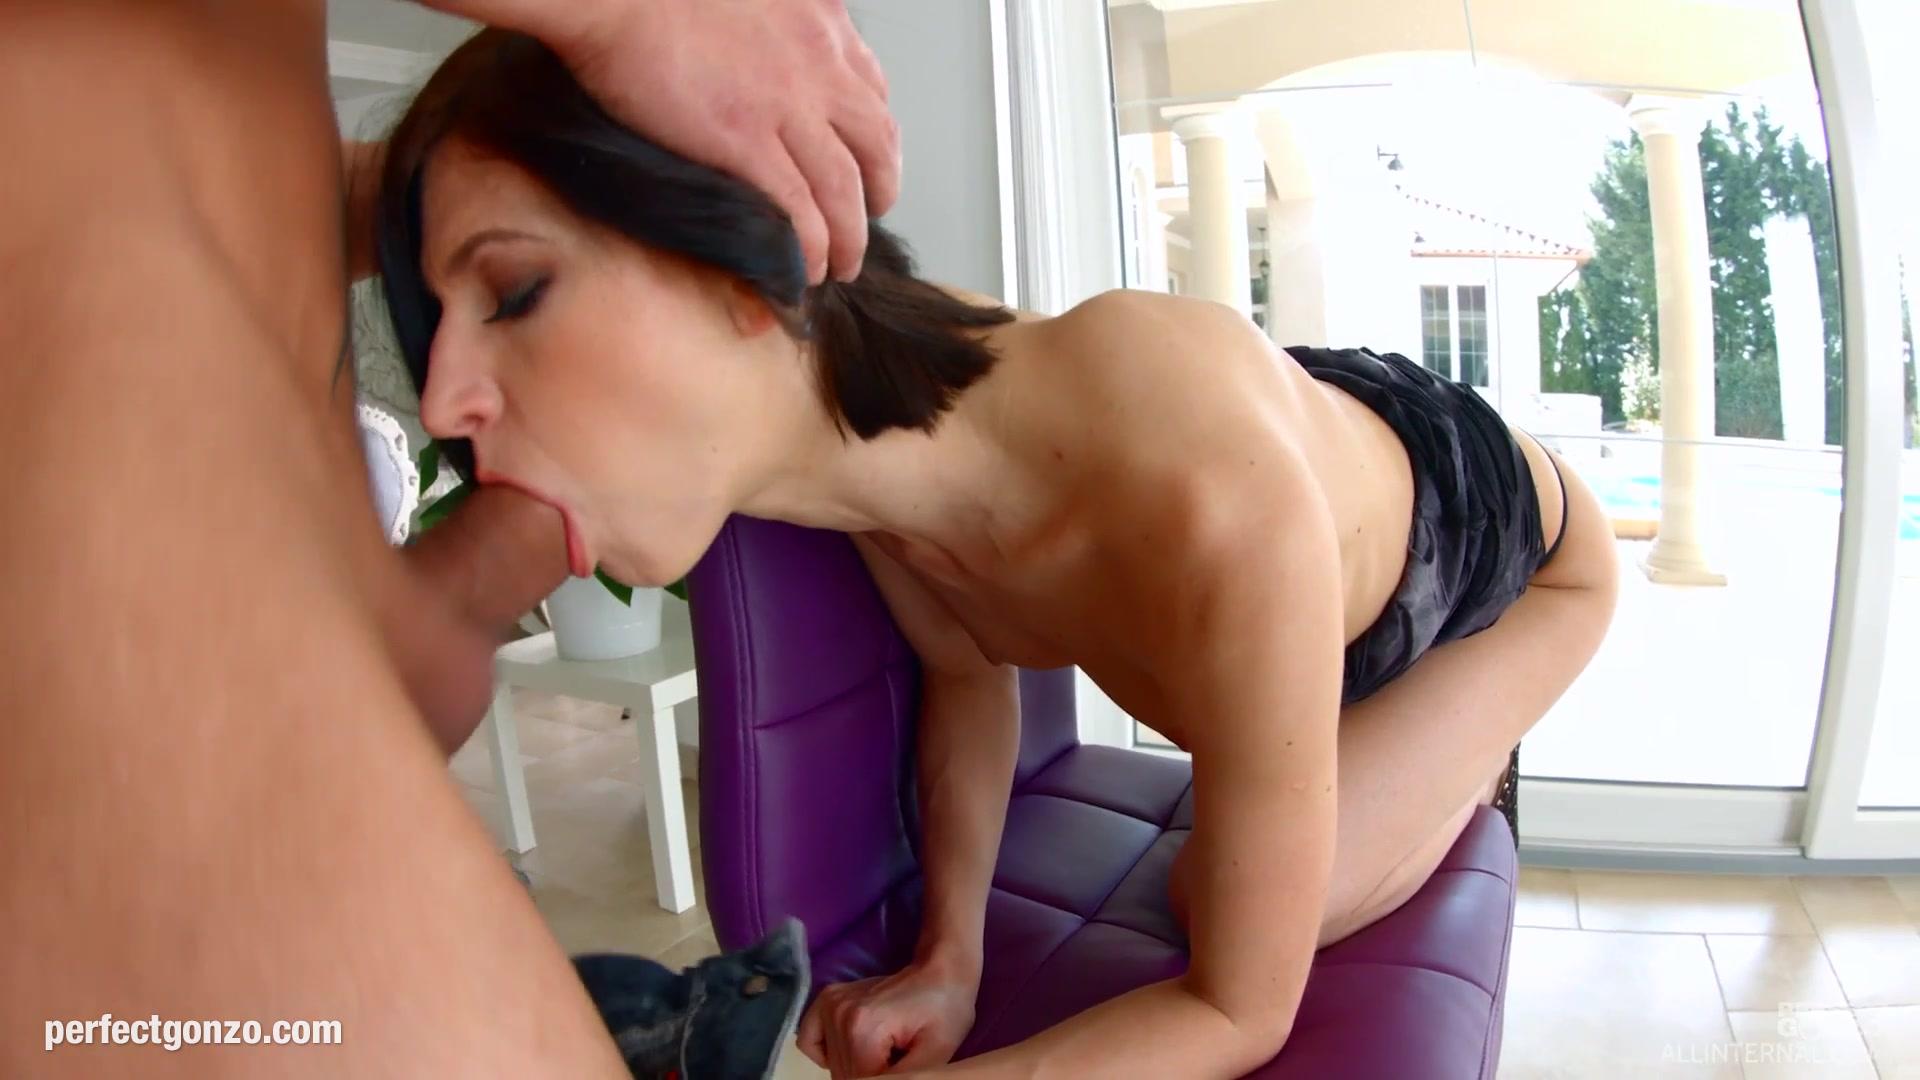 Tulsa single women Naked Porn tube